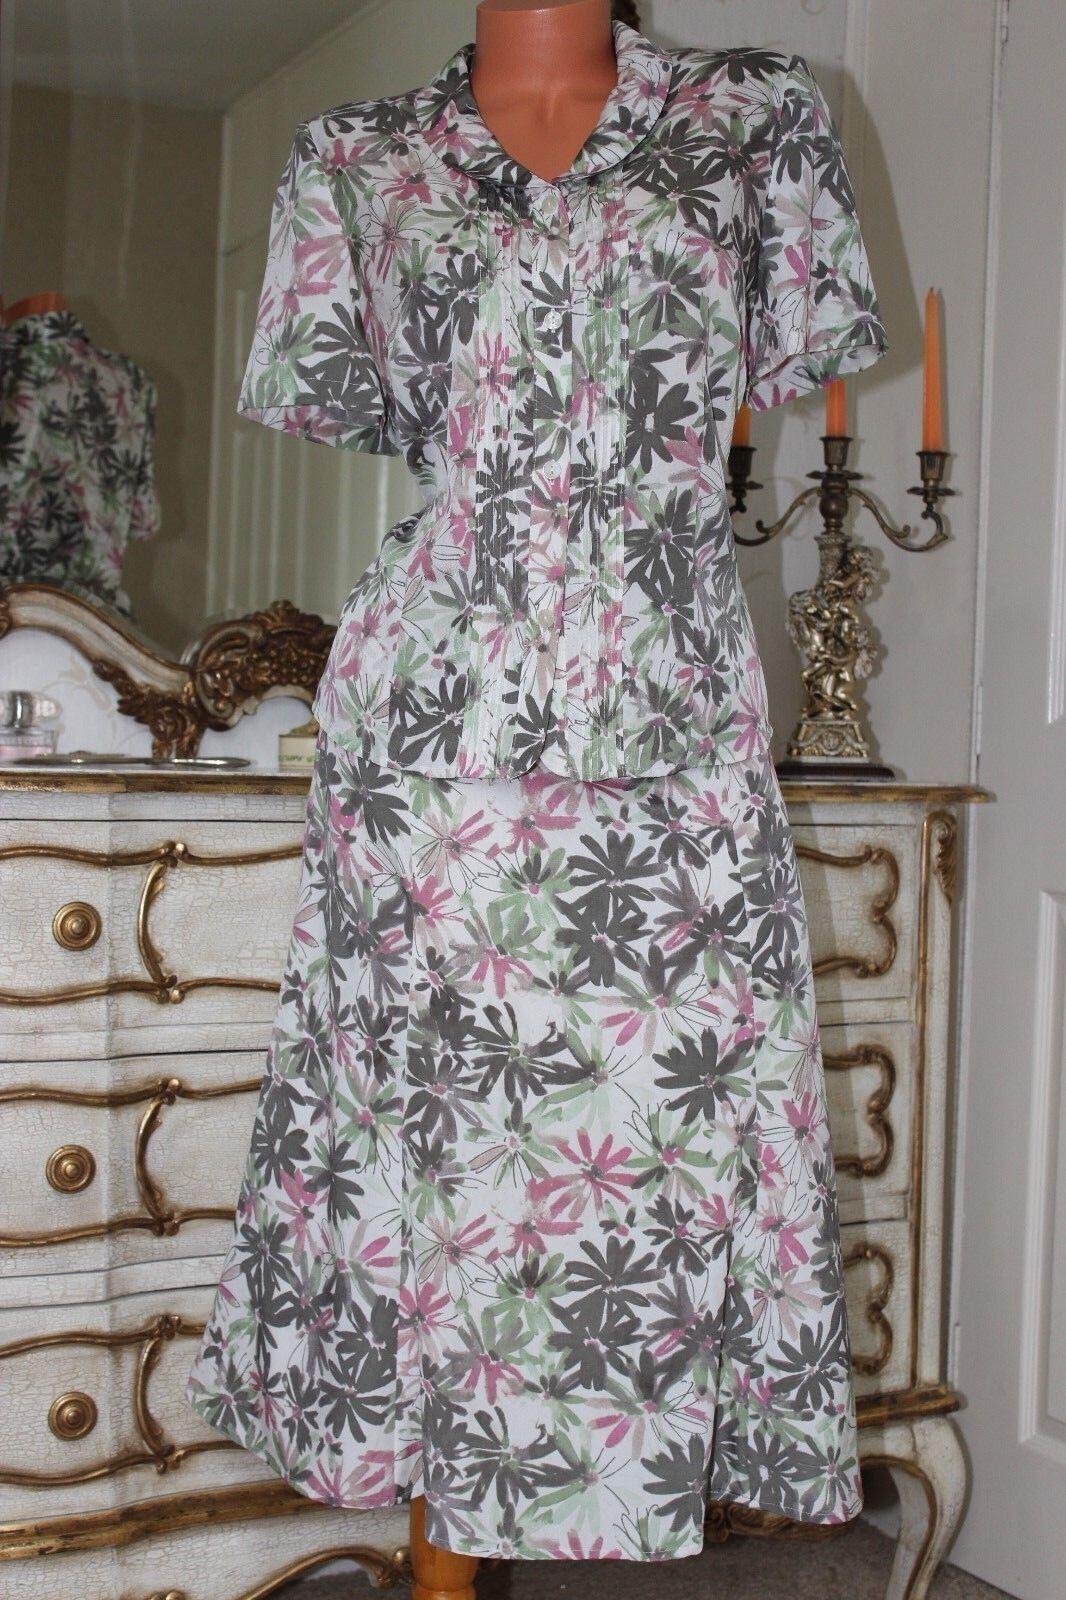 (Ref 1) EASTEX Ladies 2 Piece Set Skirt & Blouse Top Size 14